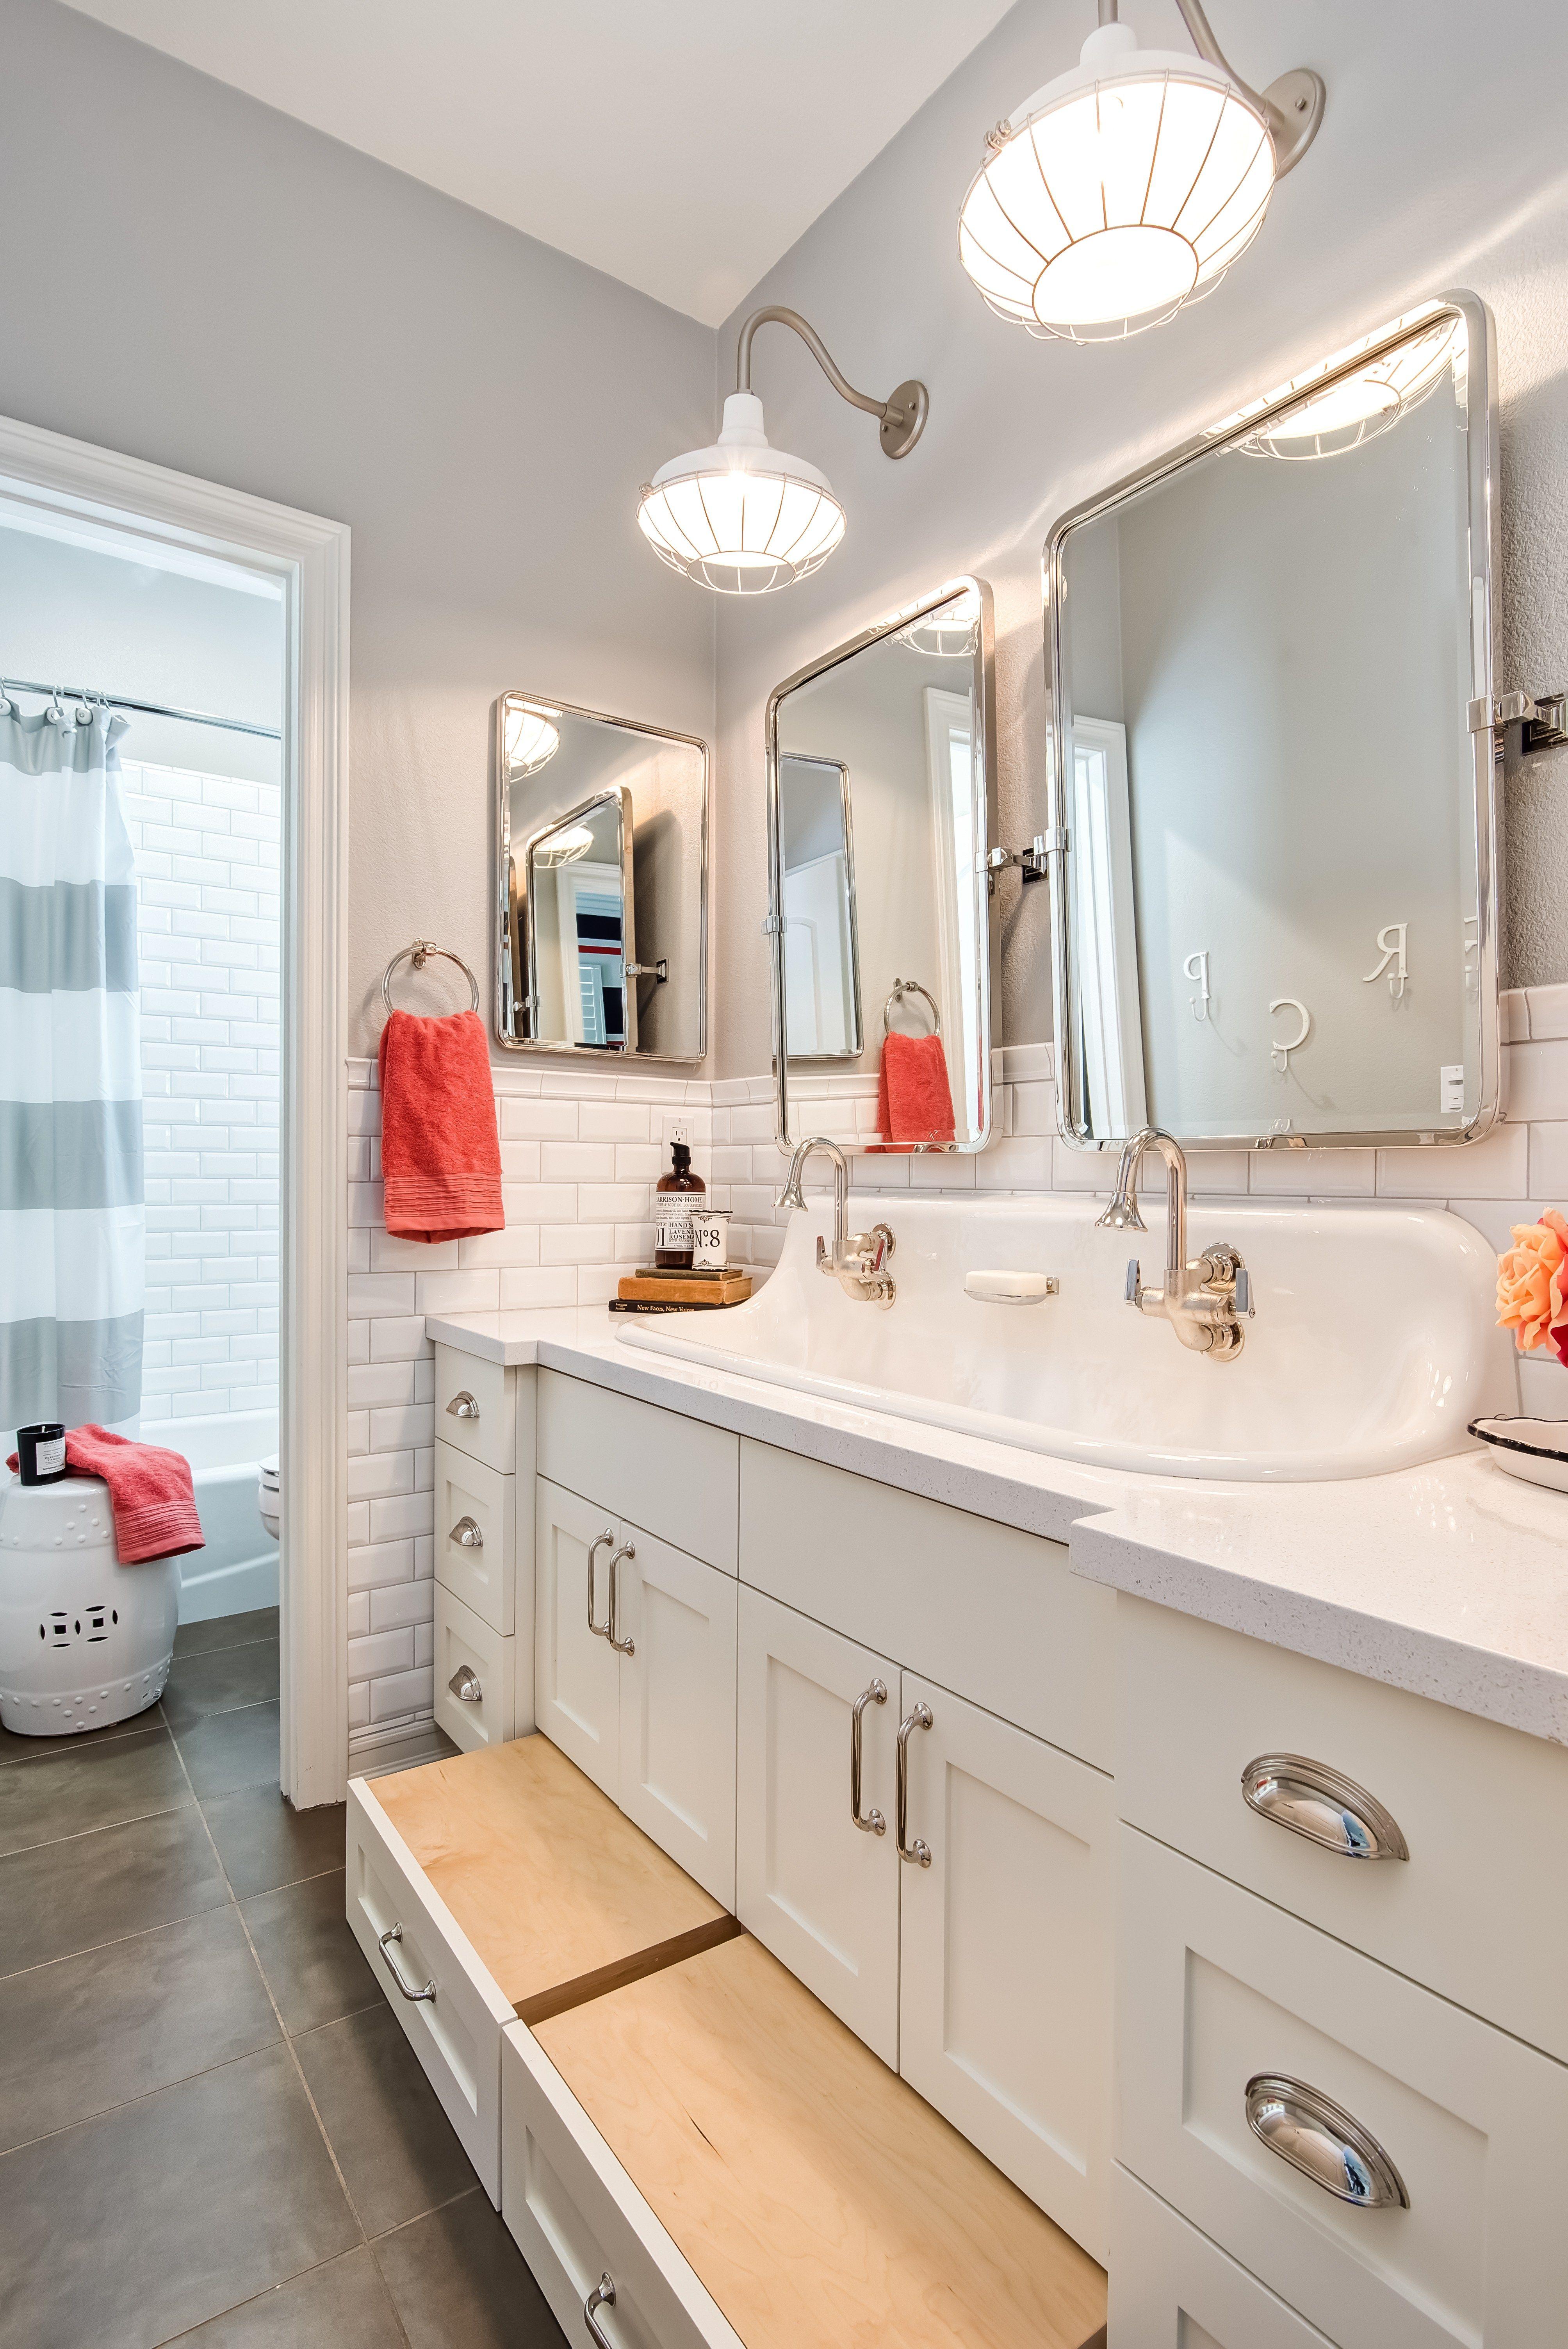 san blog construction vanities tile master in floor diego for page fixtures sinks women shower kitchen based bathroom